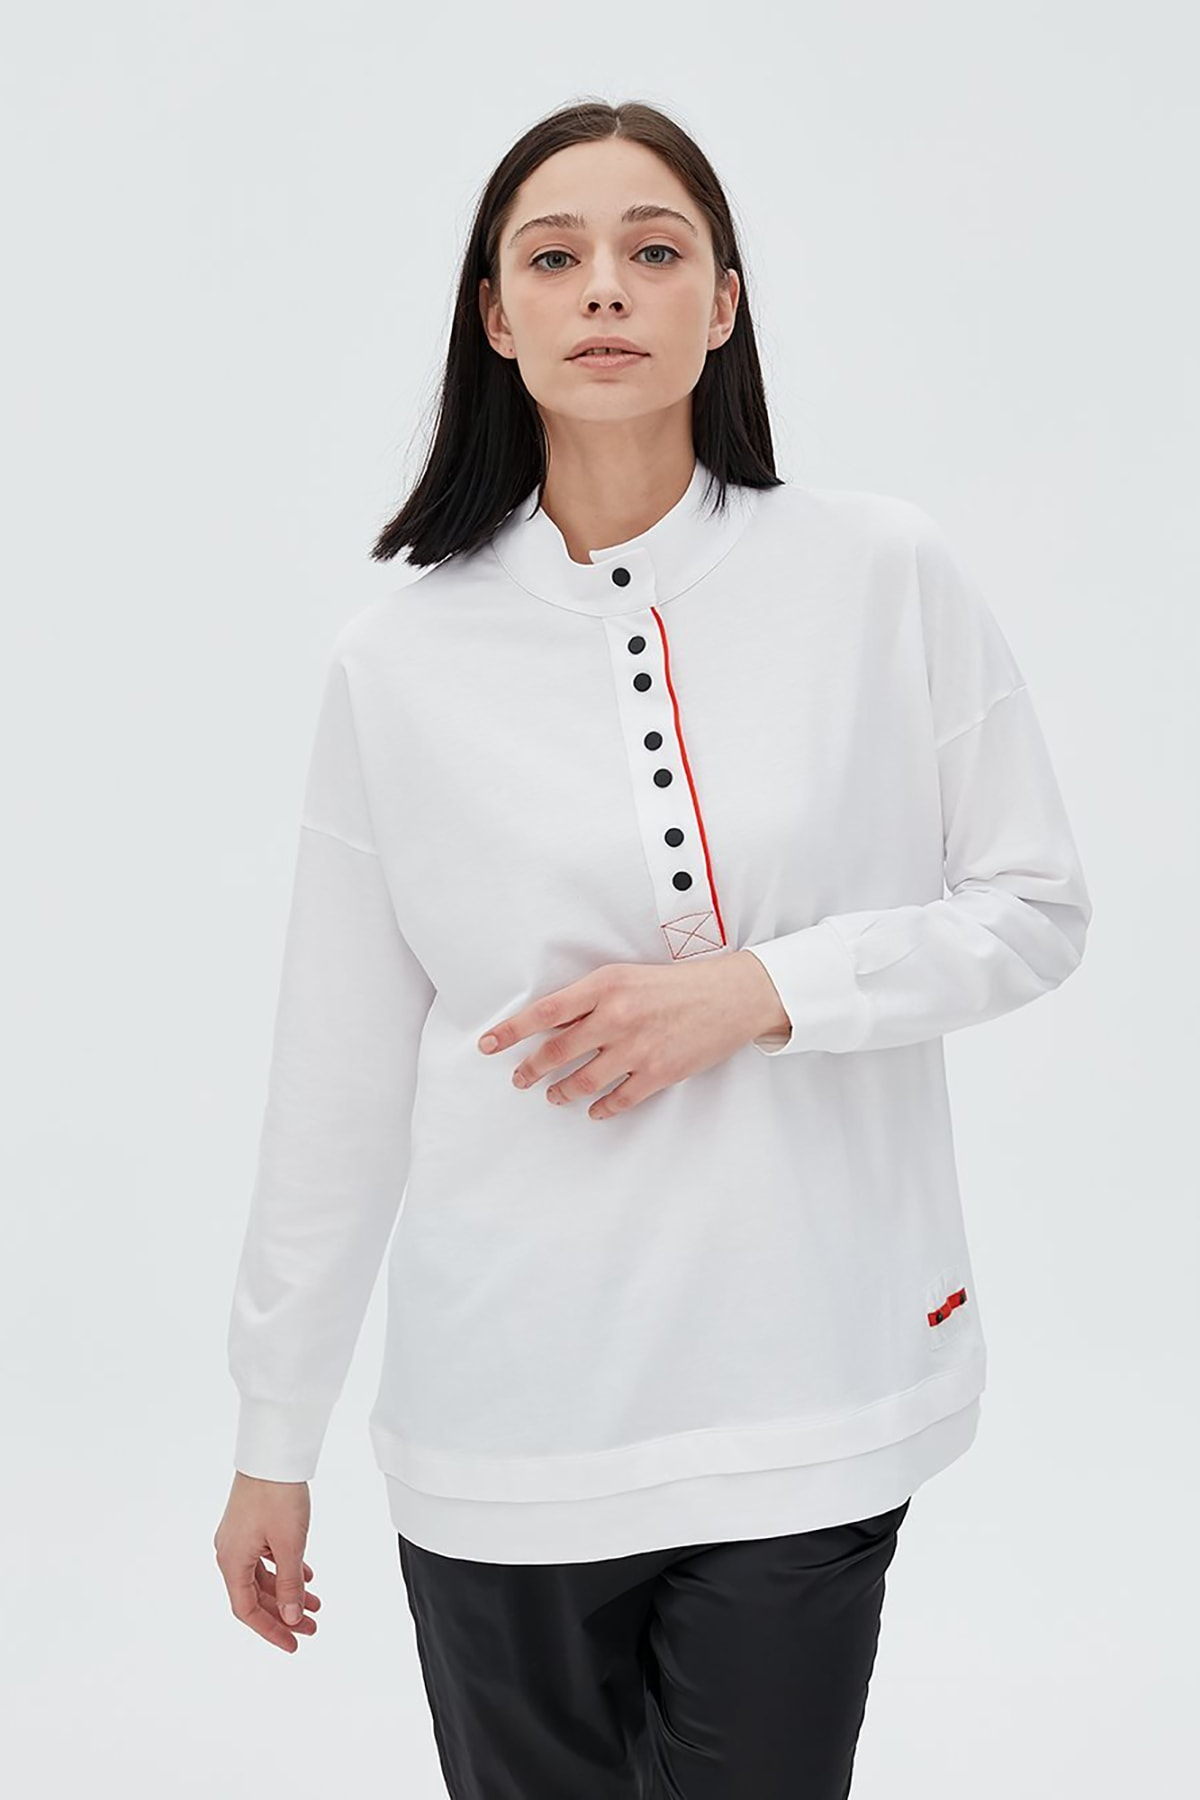 Kayra Patı Kontrast Renk Biyeli Sweatshirt Ekru B20 10032